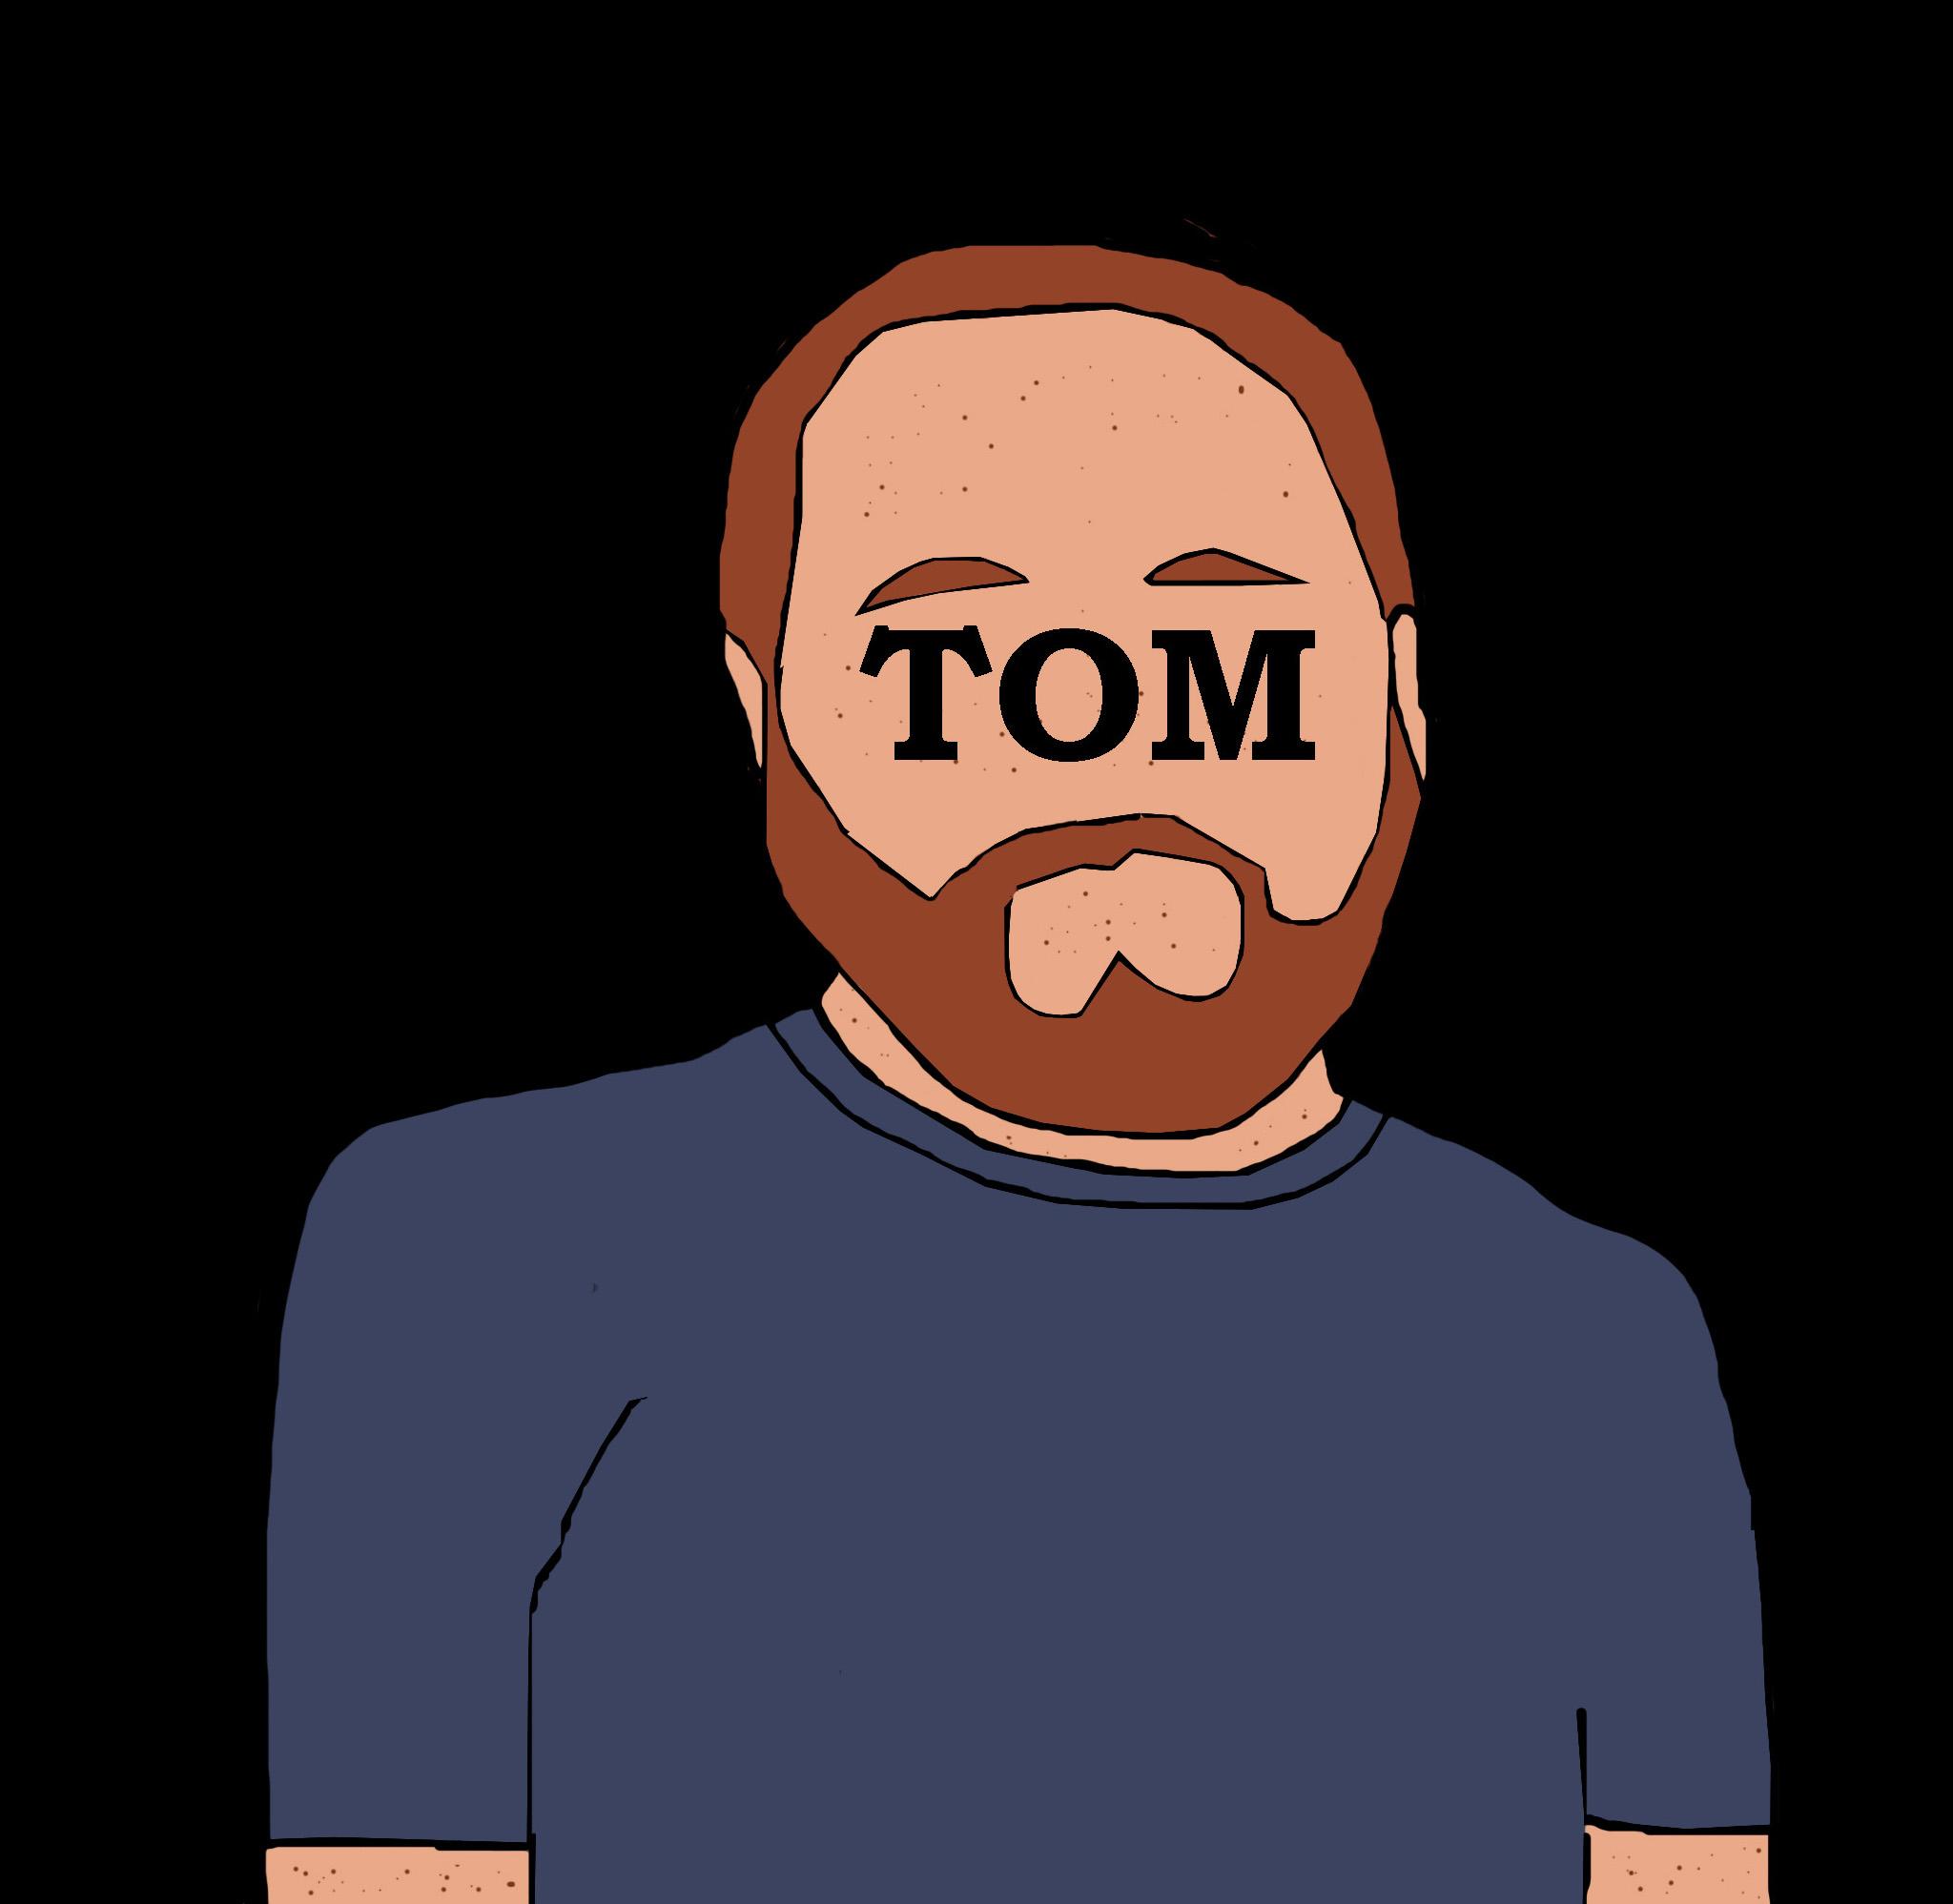 Thomas Colen - Writer. Production Designer. More details coming soon.